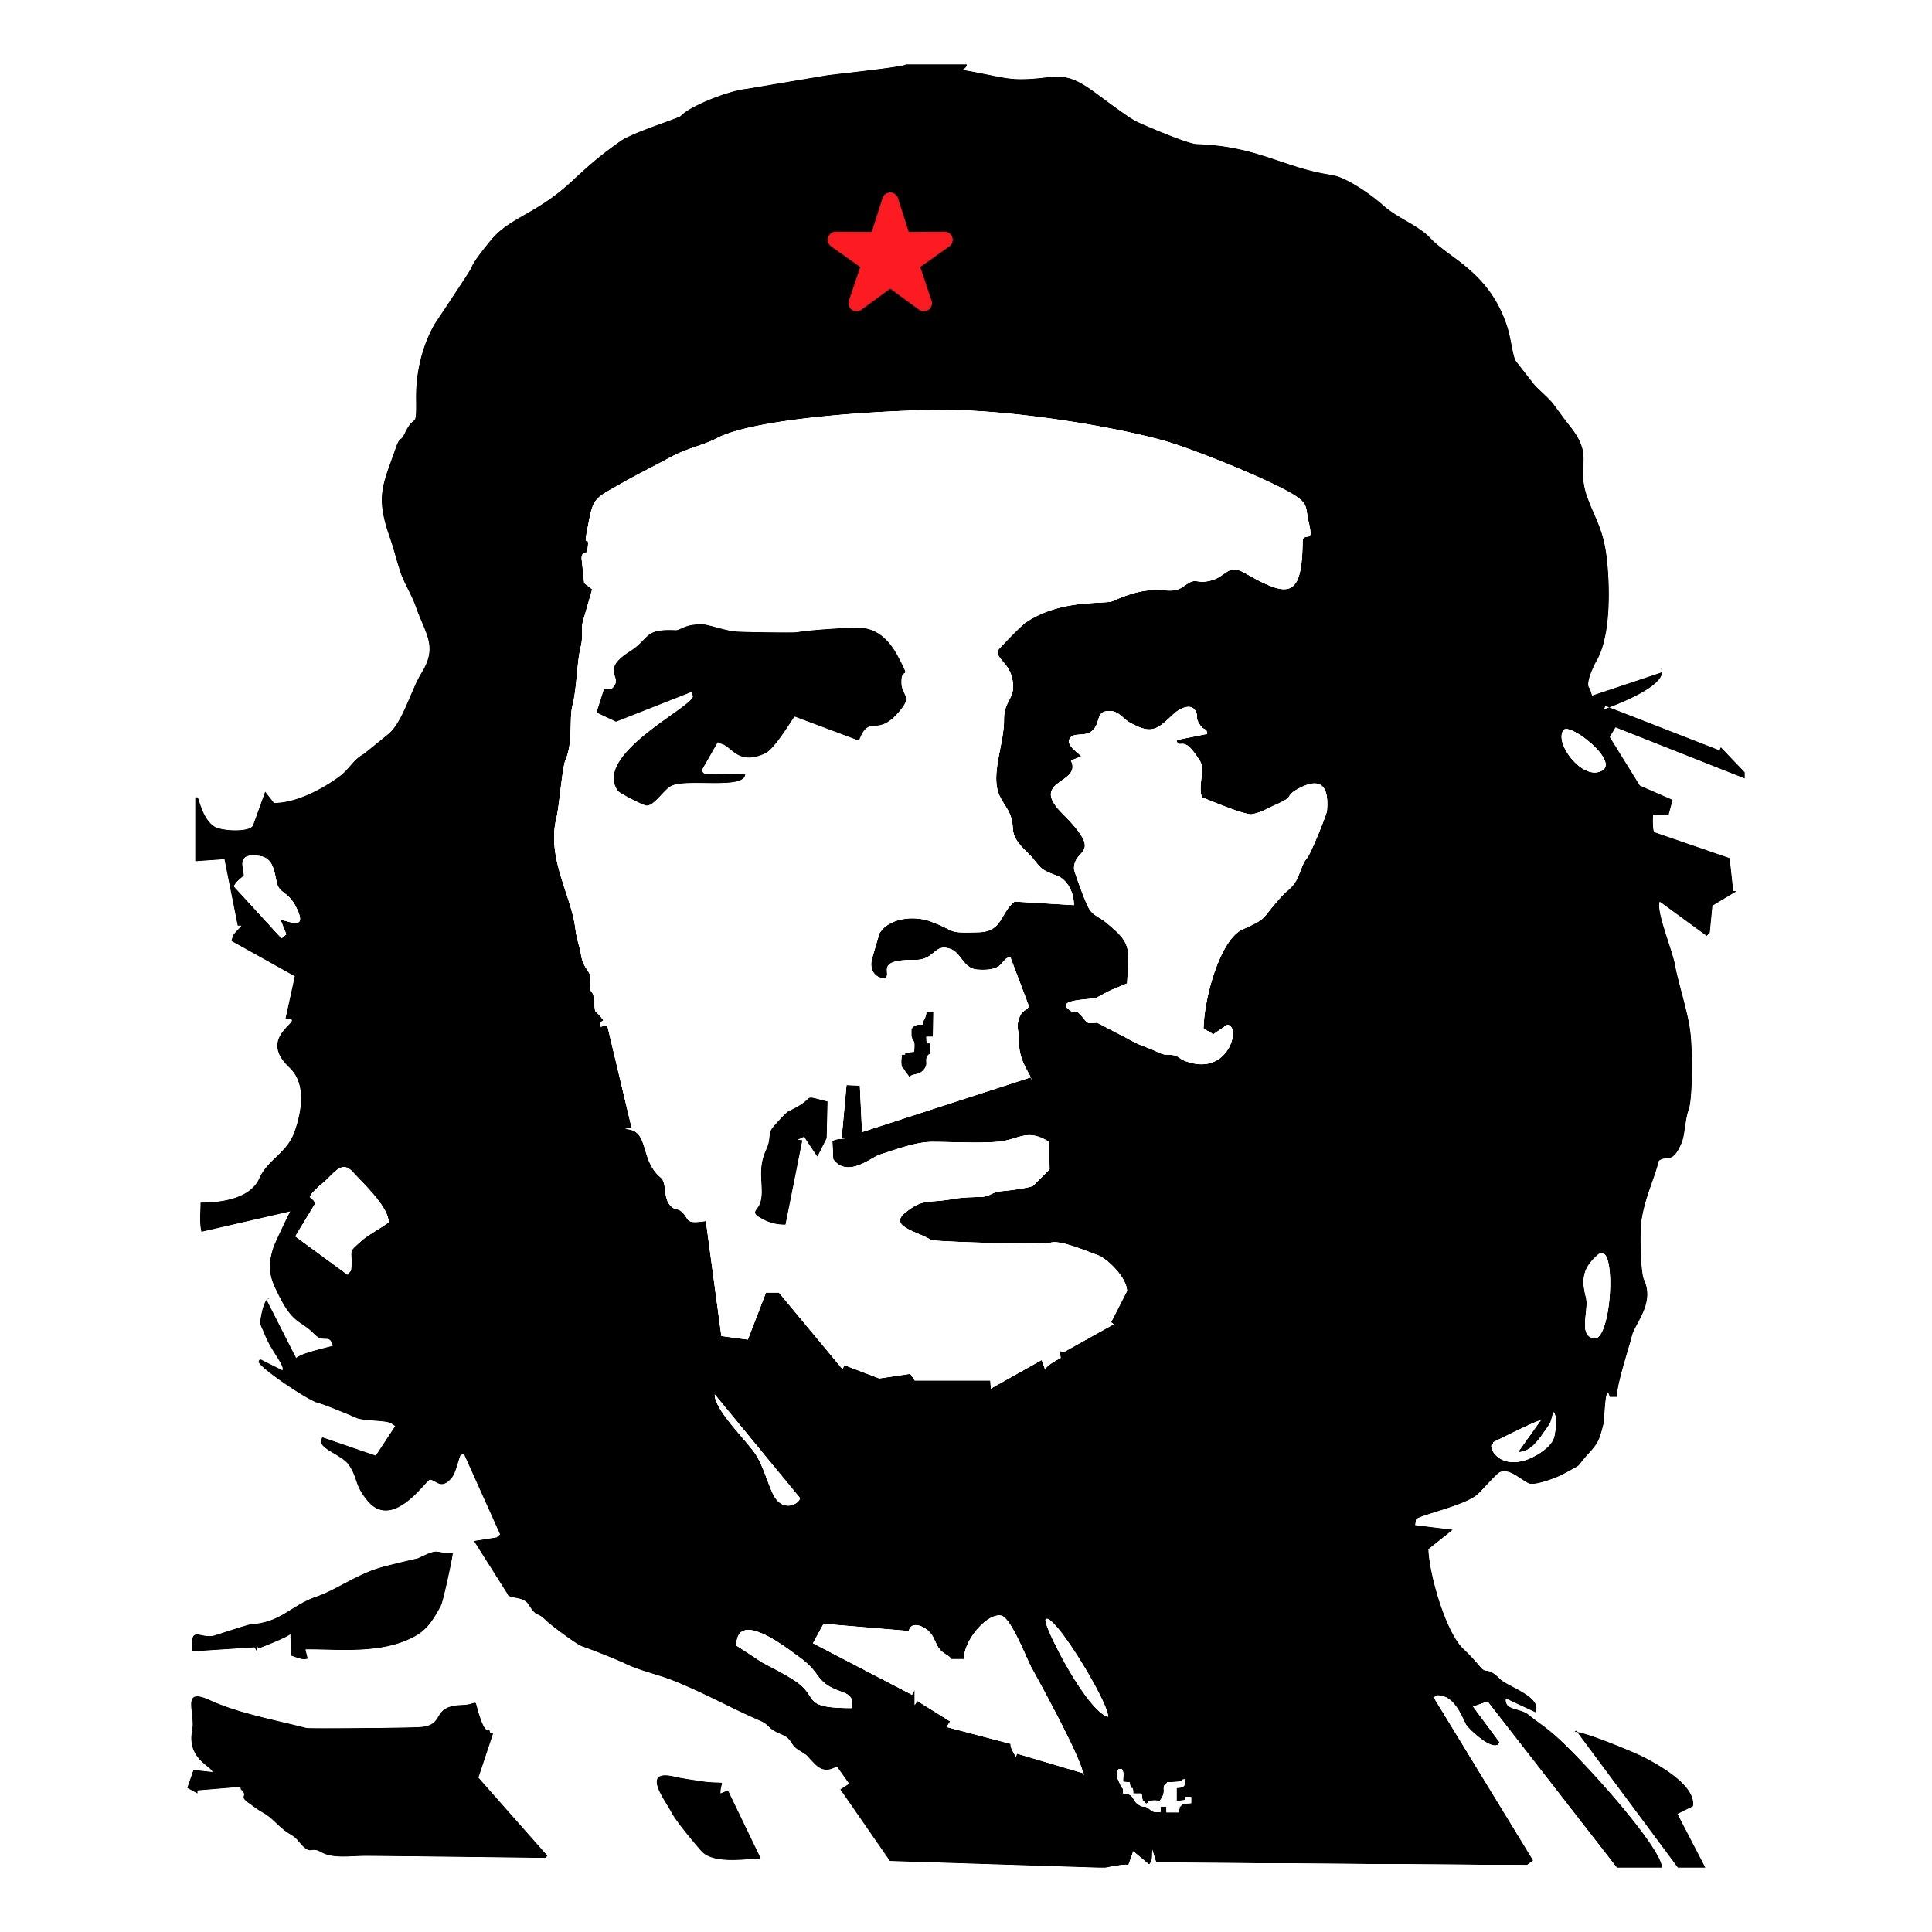 Aufkleber Che Guevara Kontur 135 x 110 mm 001